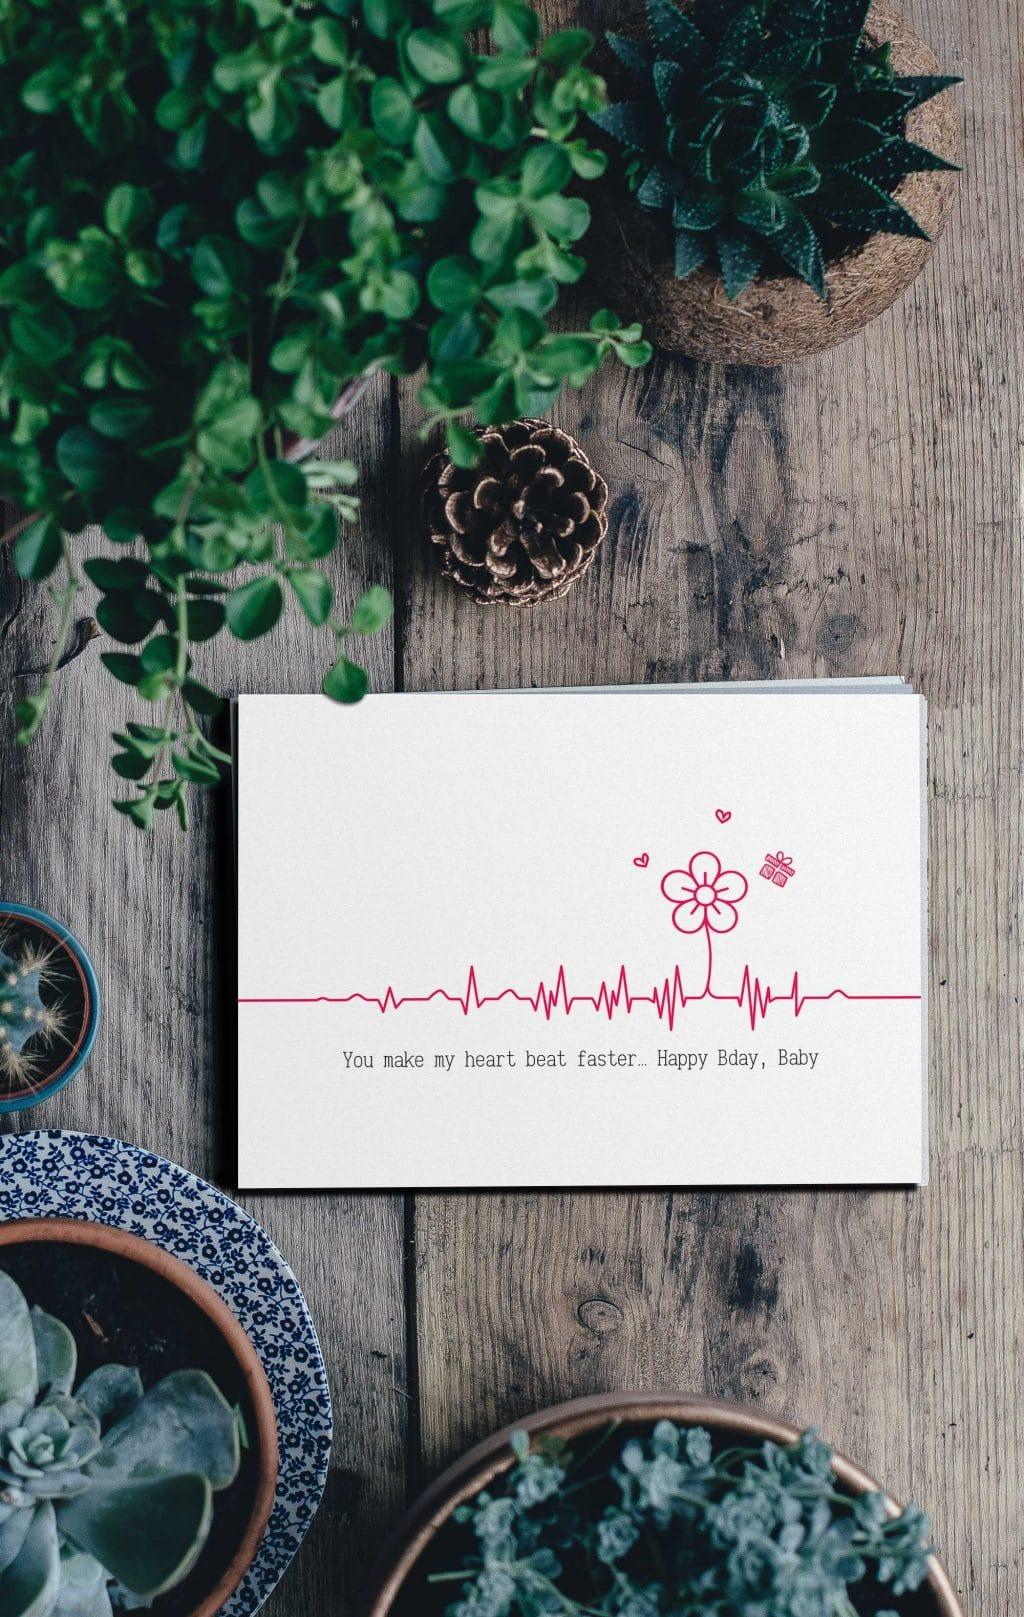 Happy BDay Postcard for Beloved